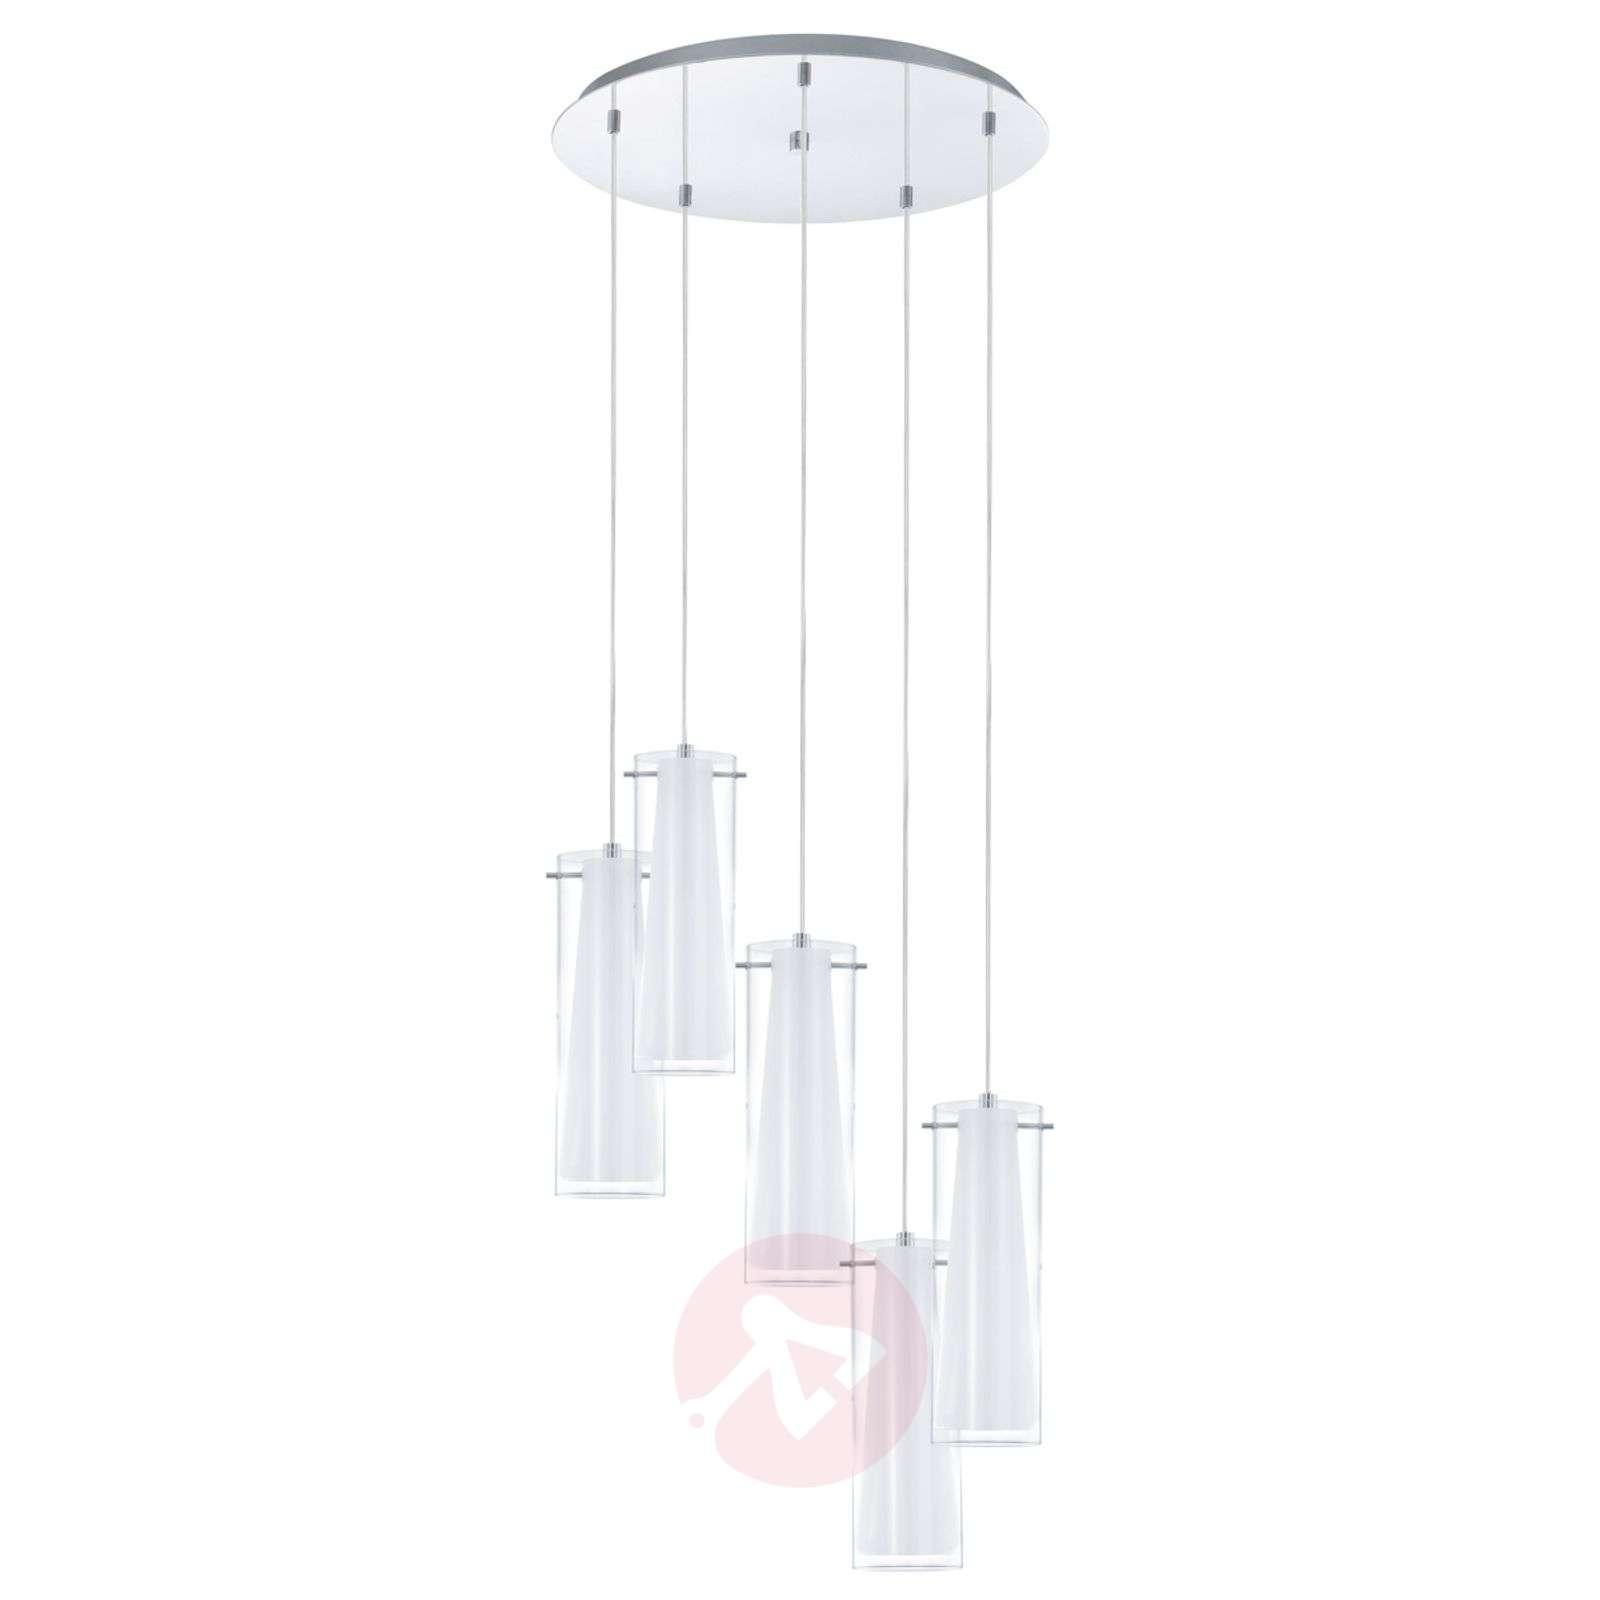 Pendant lamp Pinto 5 Lamp-3031515-02